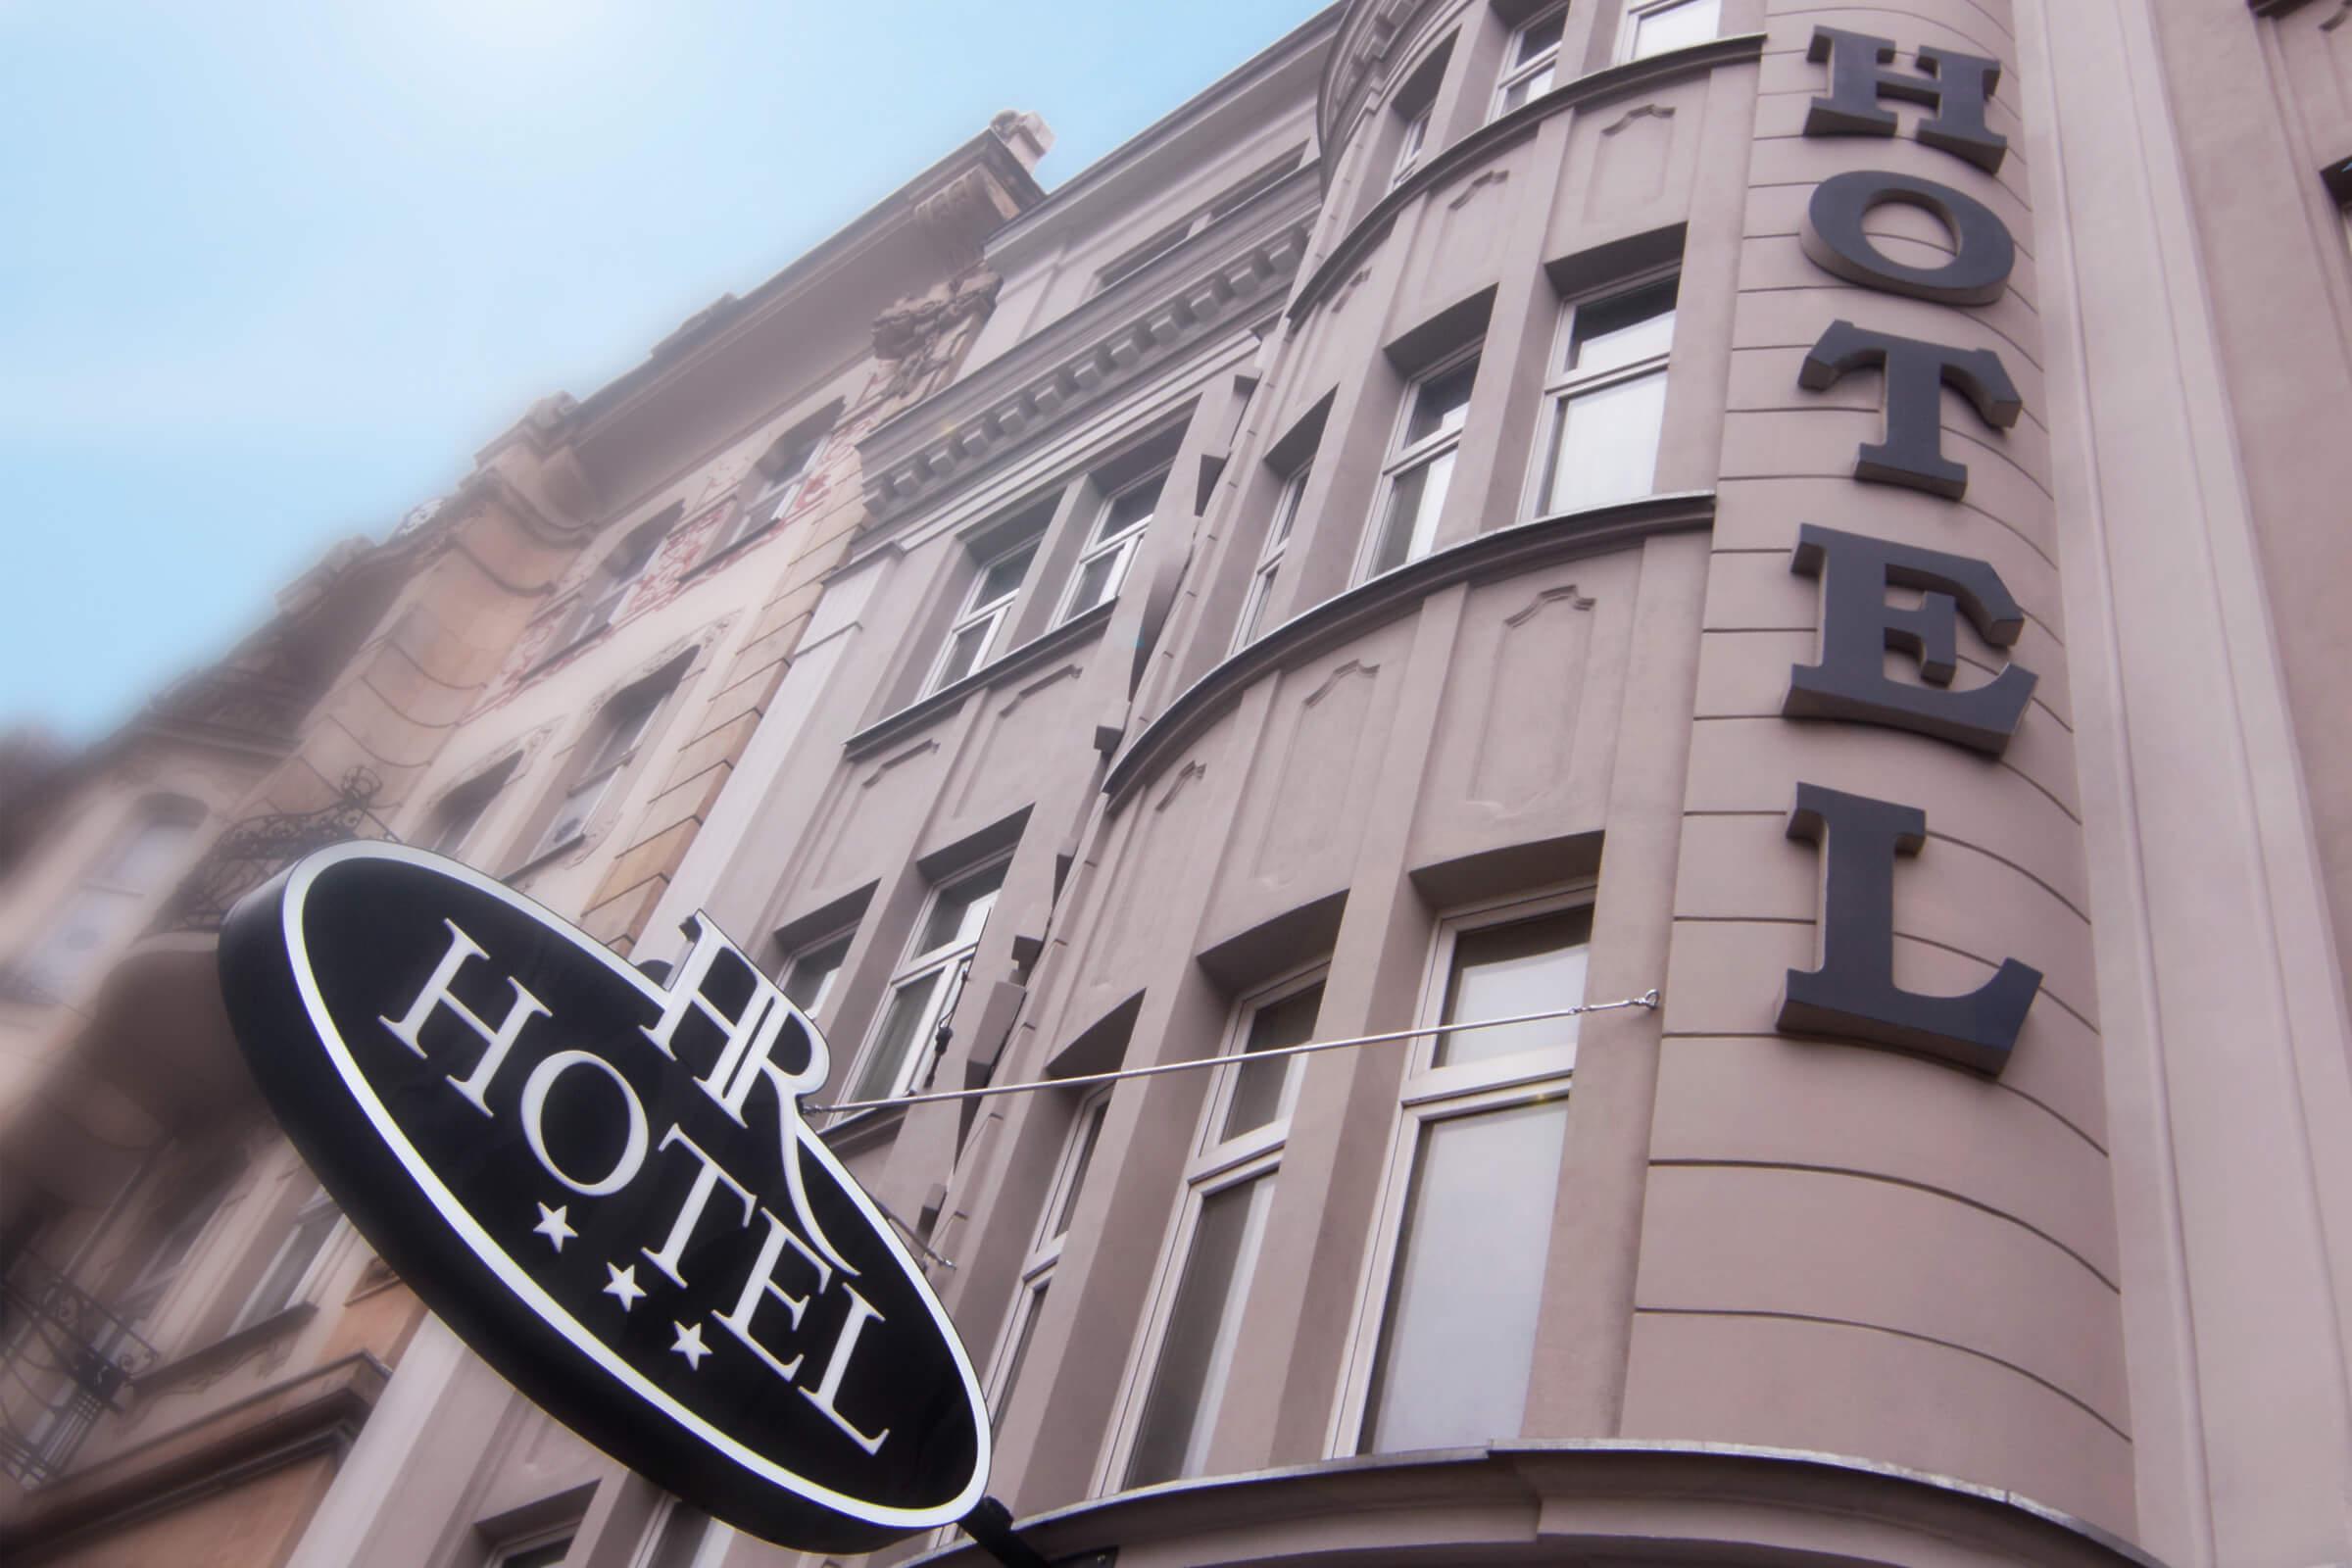 Fasada budynku Hotel Royal Poznań